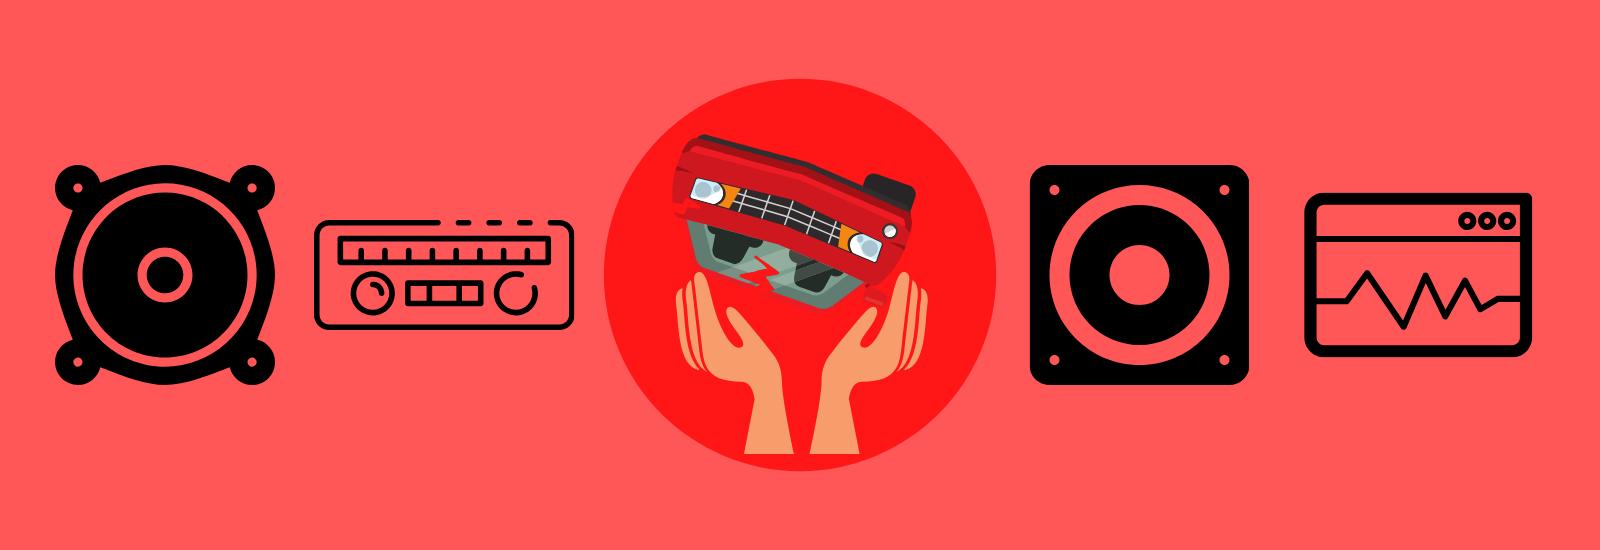 car audio gear best roundup posts